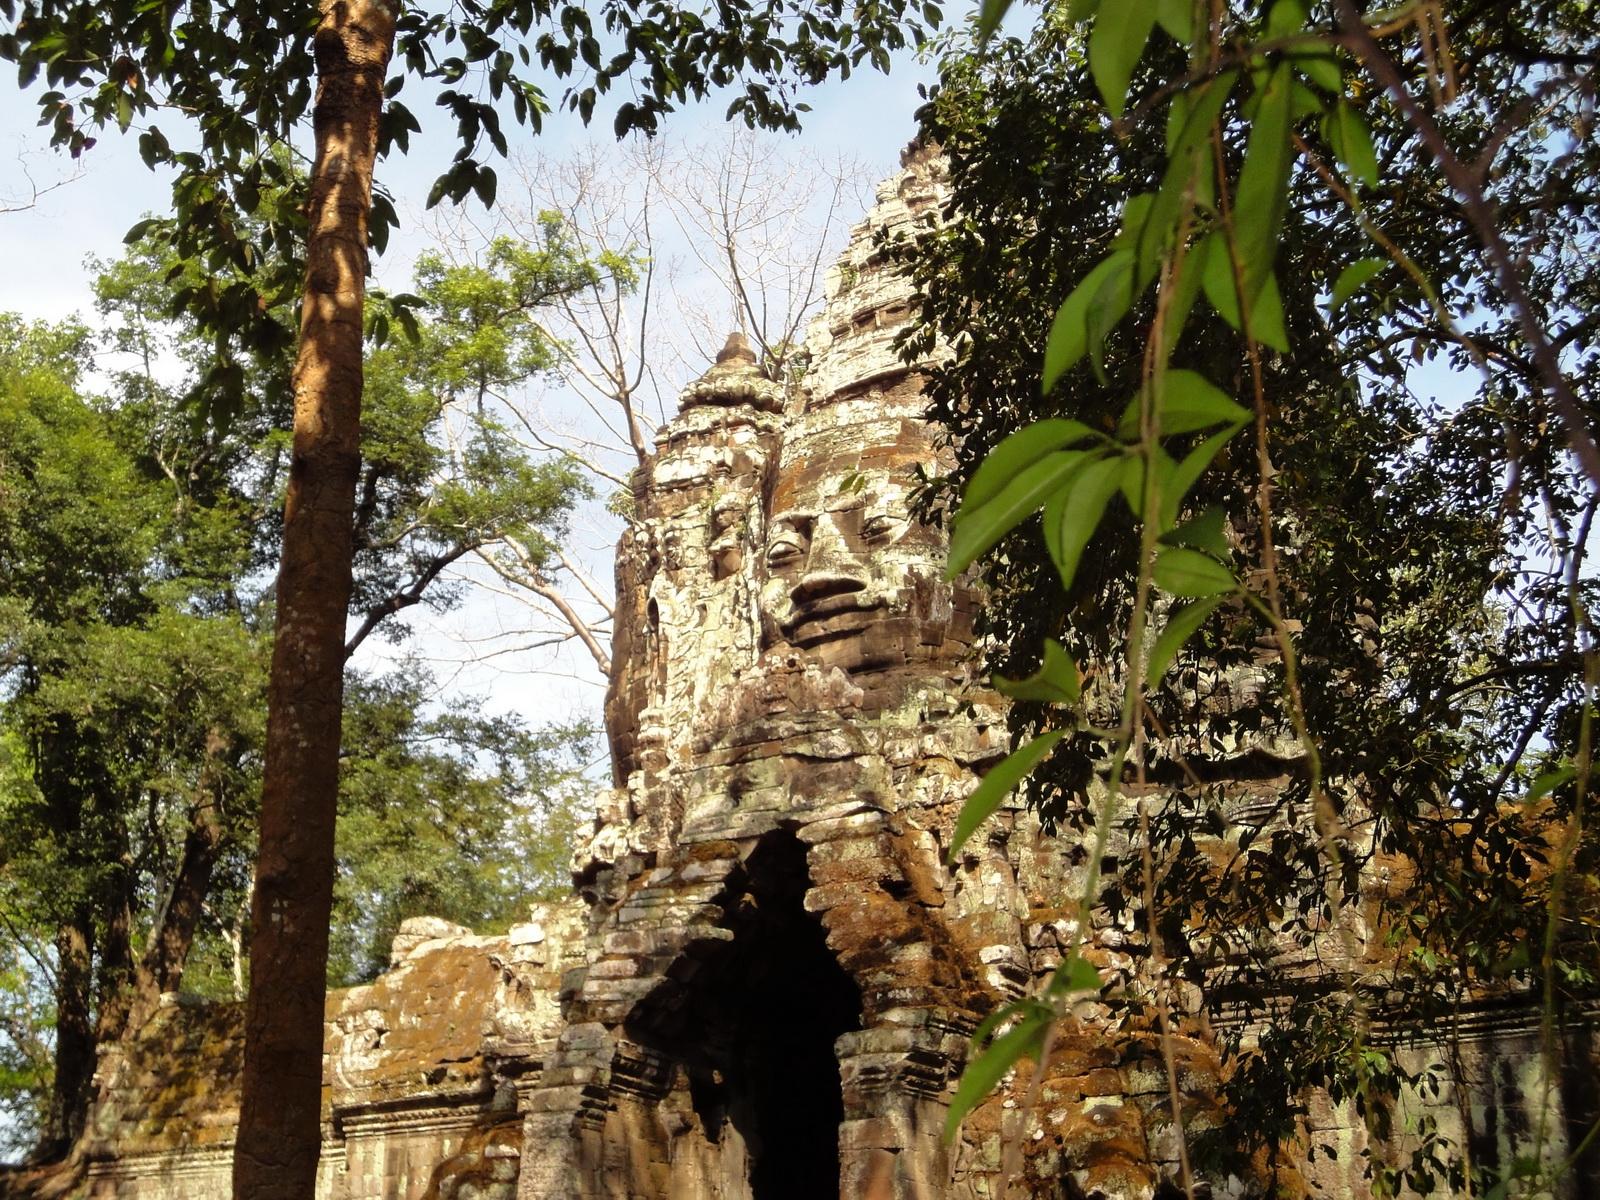 Angkor Wat style architecture North Gate Jan 2010 07